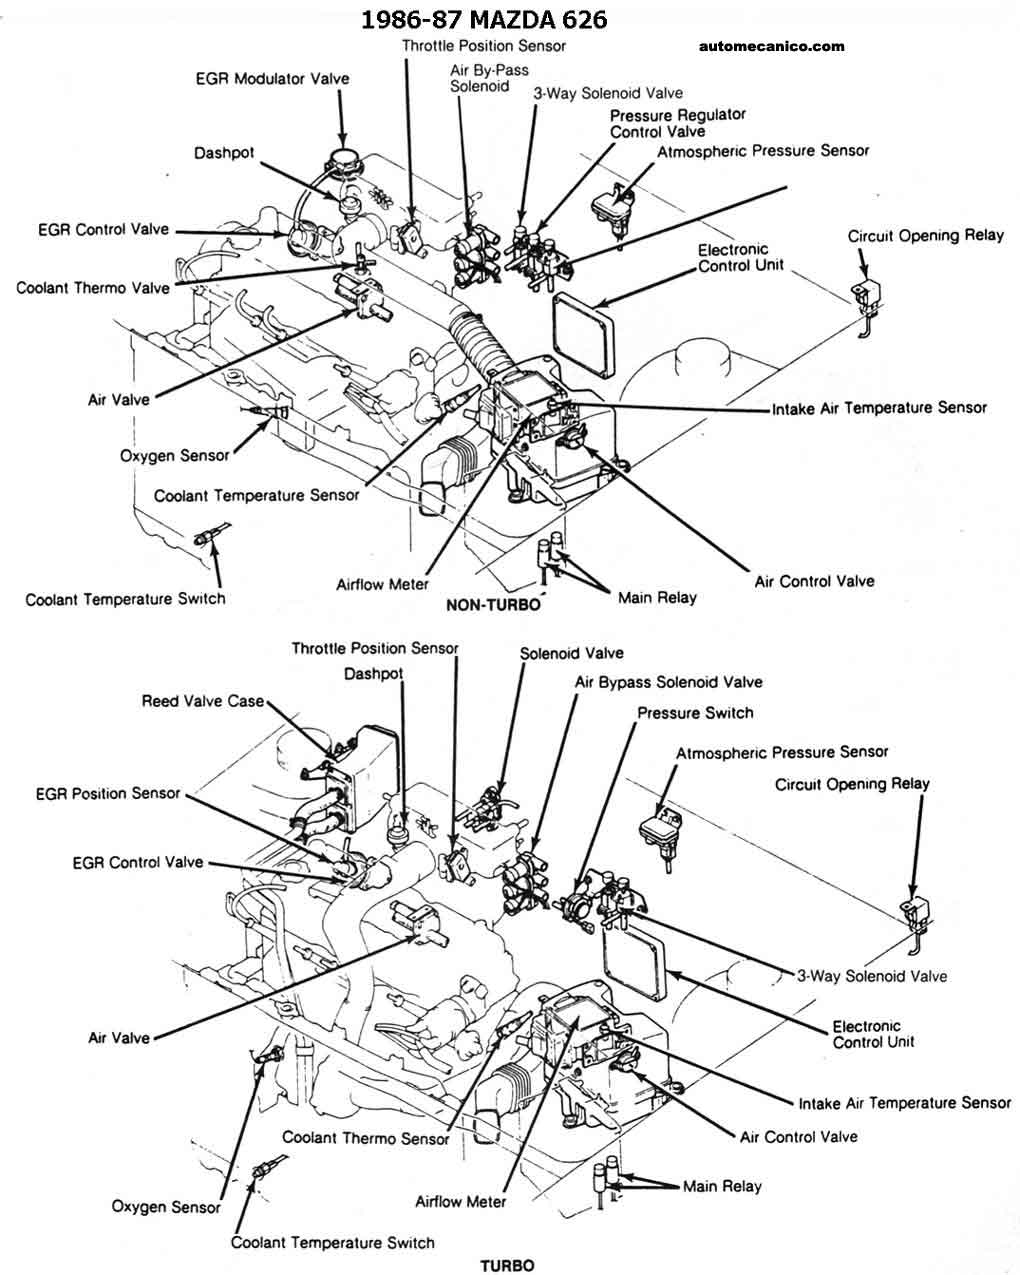 Mazda B2200 Wiringdiagram Image Details 3 Way Solenoid Valve Wiring Diagram